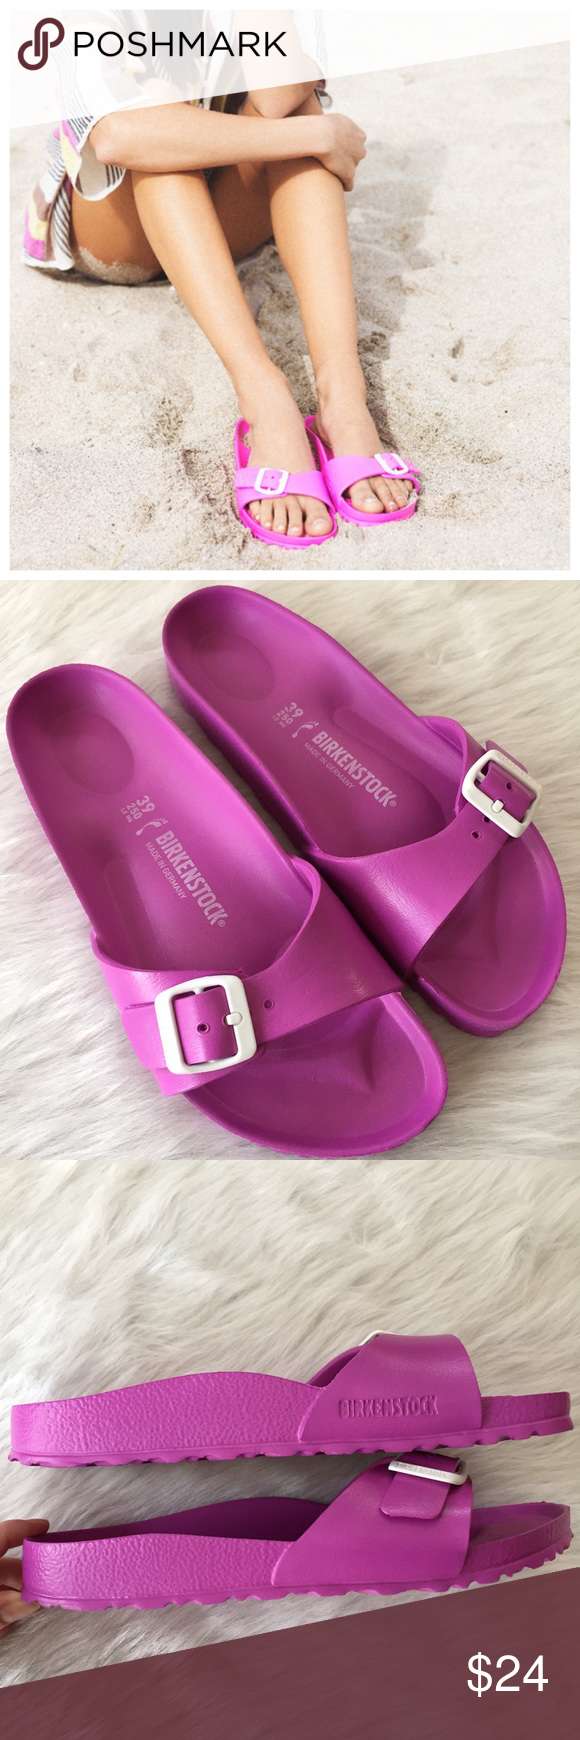 94079392409 Birkenstock Madrid Eva pink sandals Adorable pink Birks in like new  condition! Sz 39